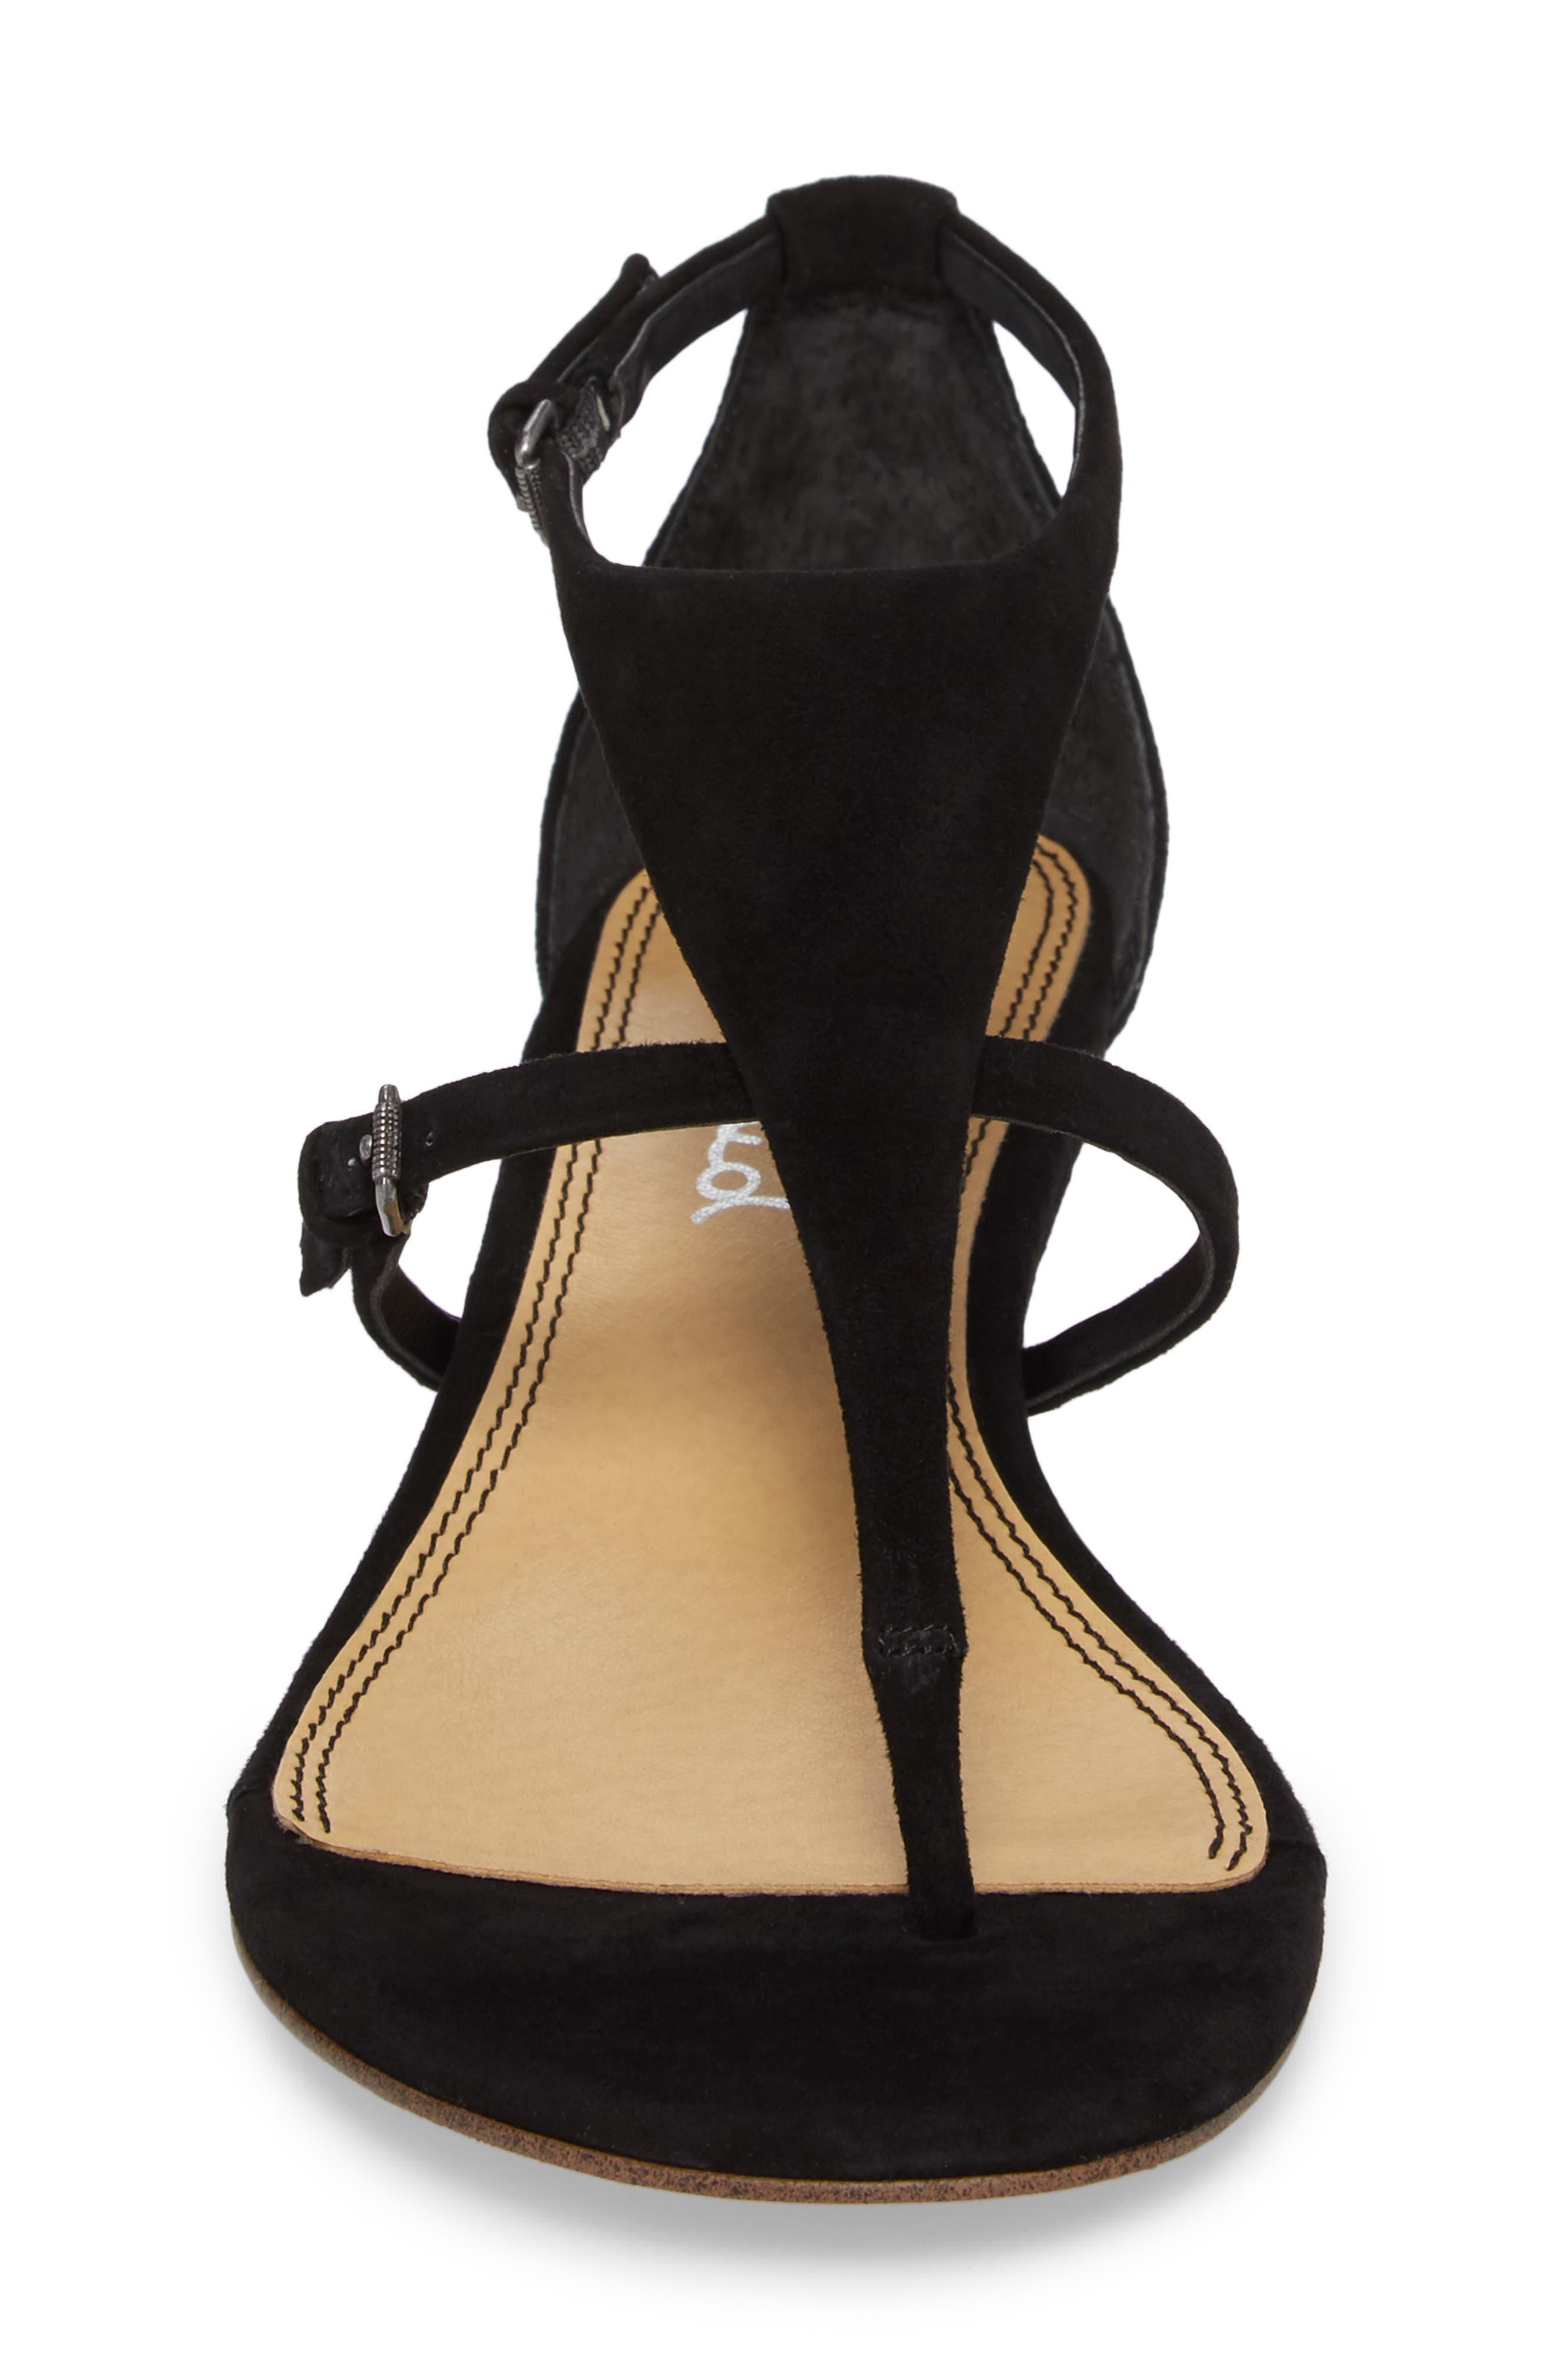 Brooklyn V-Strap Wedge Sandal,                             Alternate thumbnail 13, color,